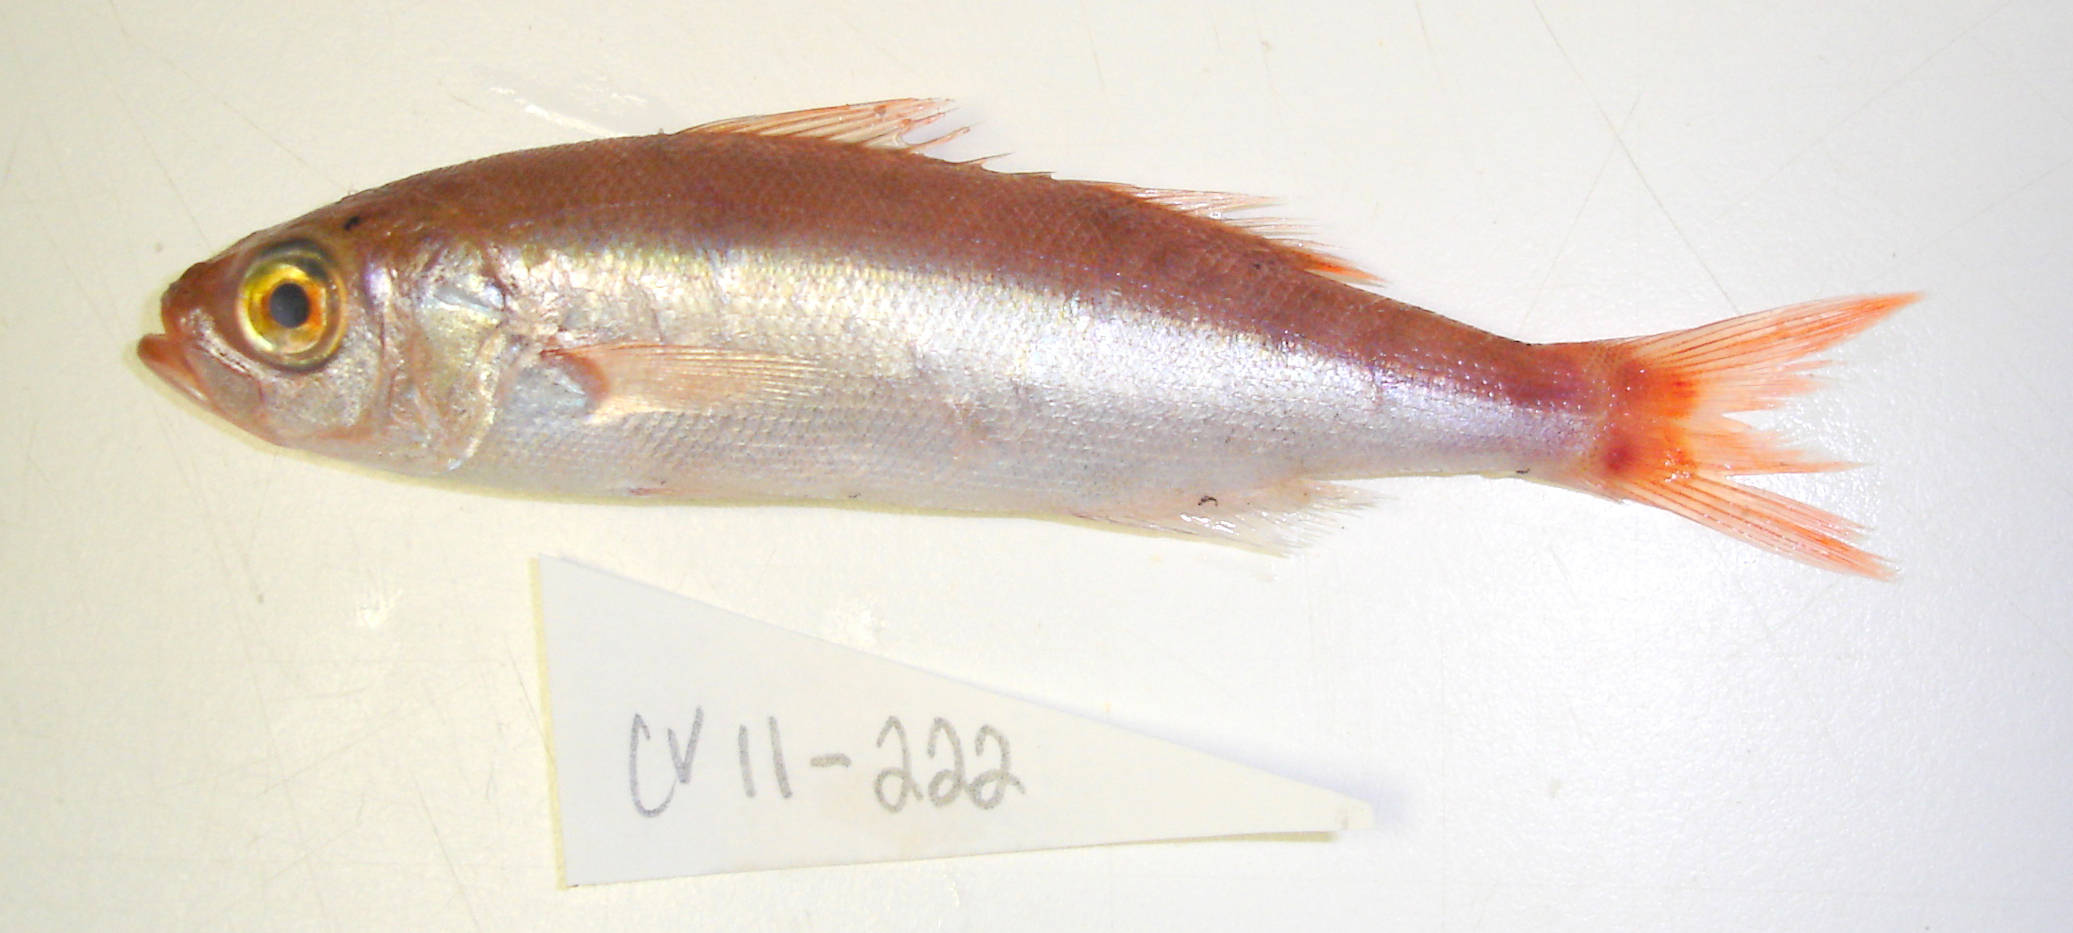 Image of Atlantic rubyfish